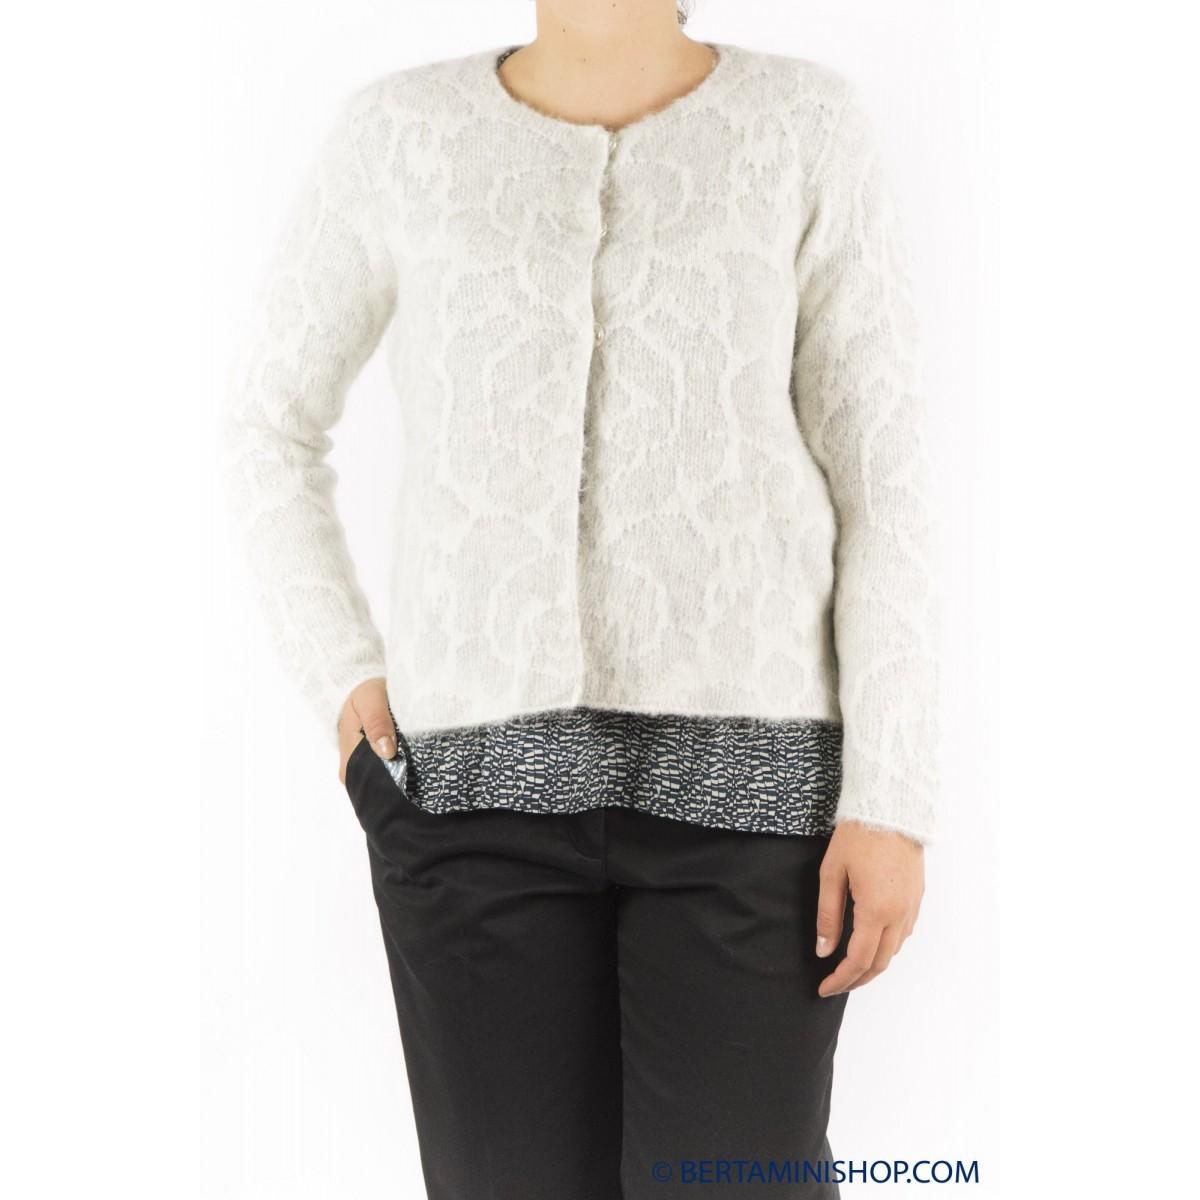 Cardigan Kangra Woman - 9610/58 29 - PERLA